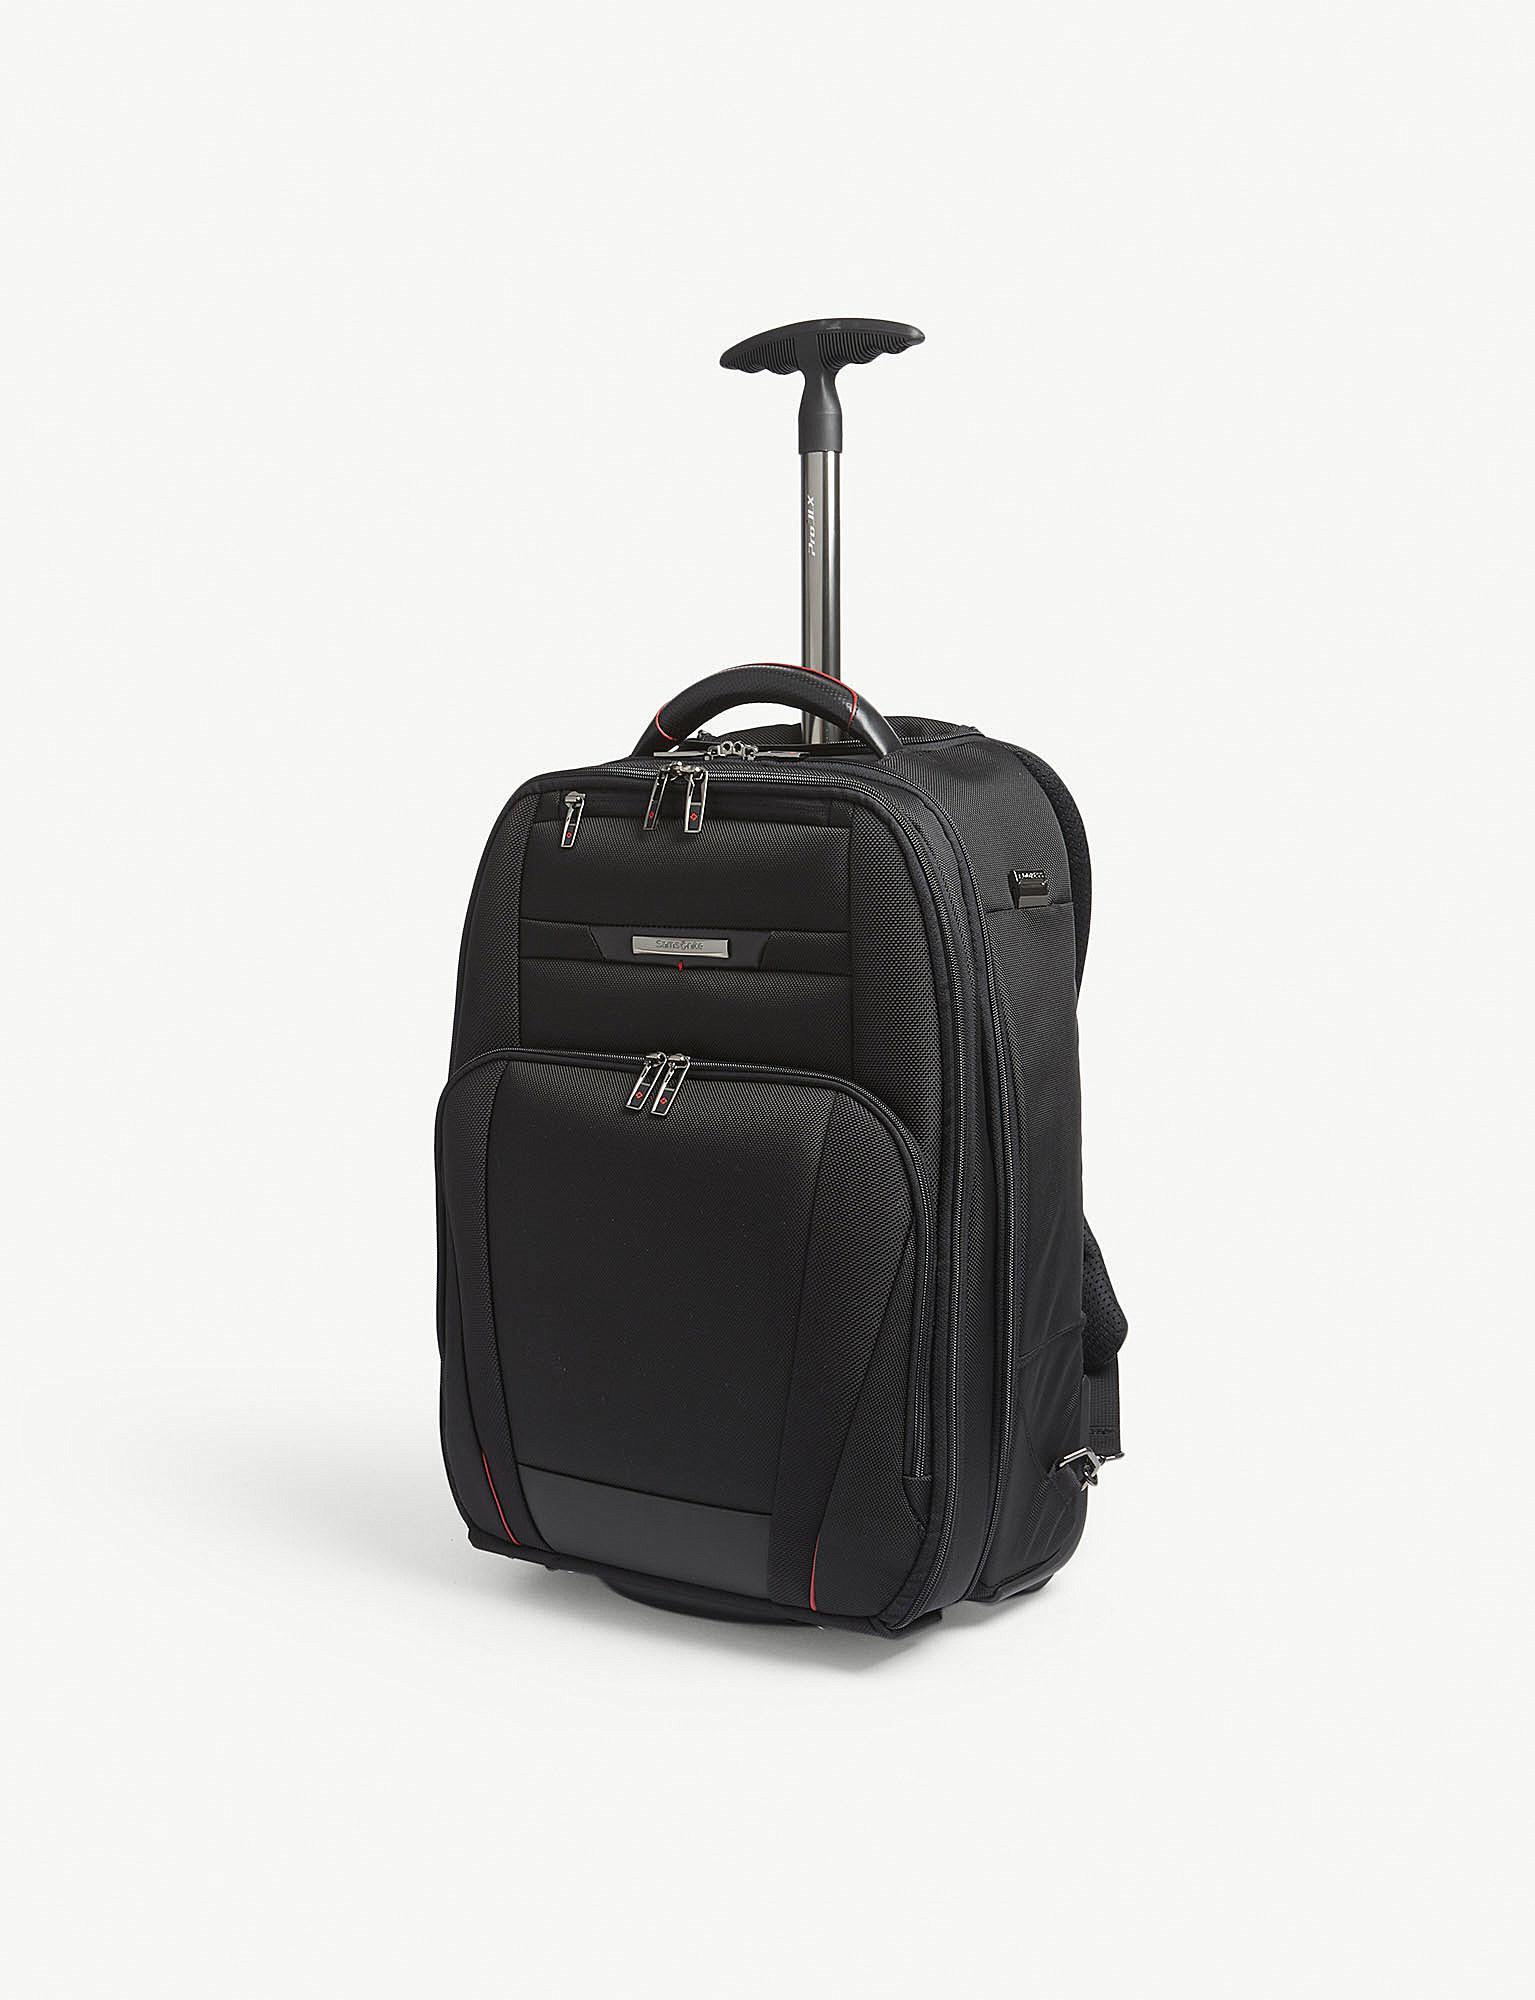 5861e18935 Lyst - Samsonite Black Pro Dlx 5 Laptop Backpack in Black for Men